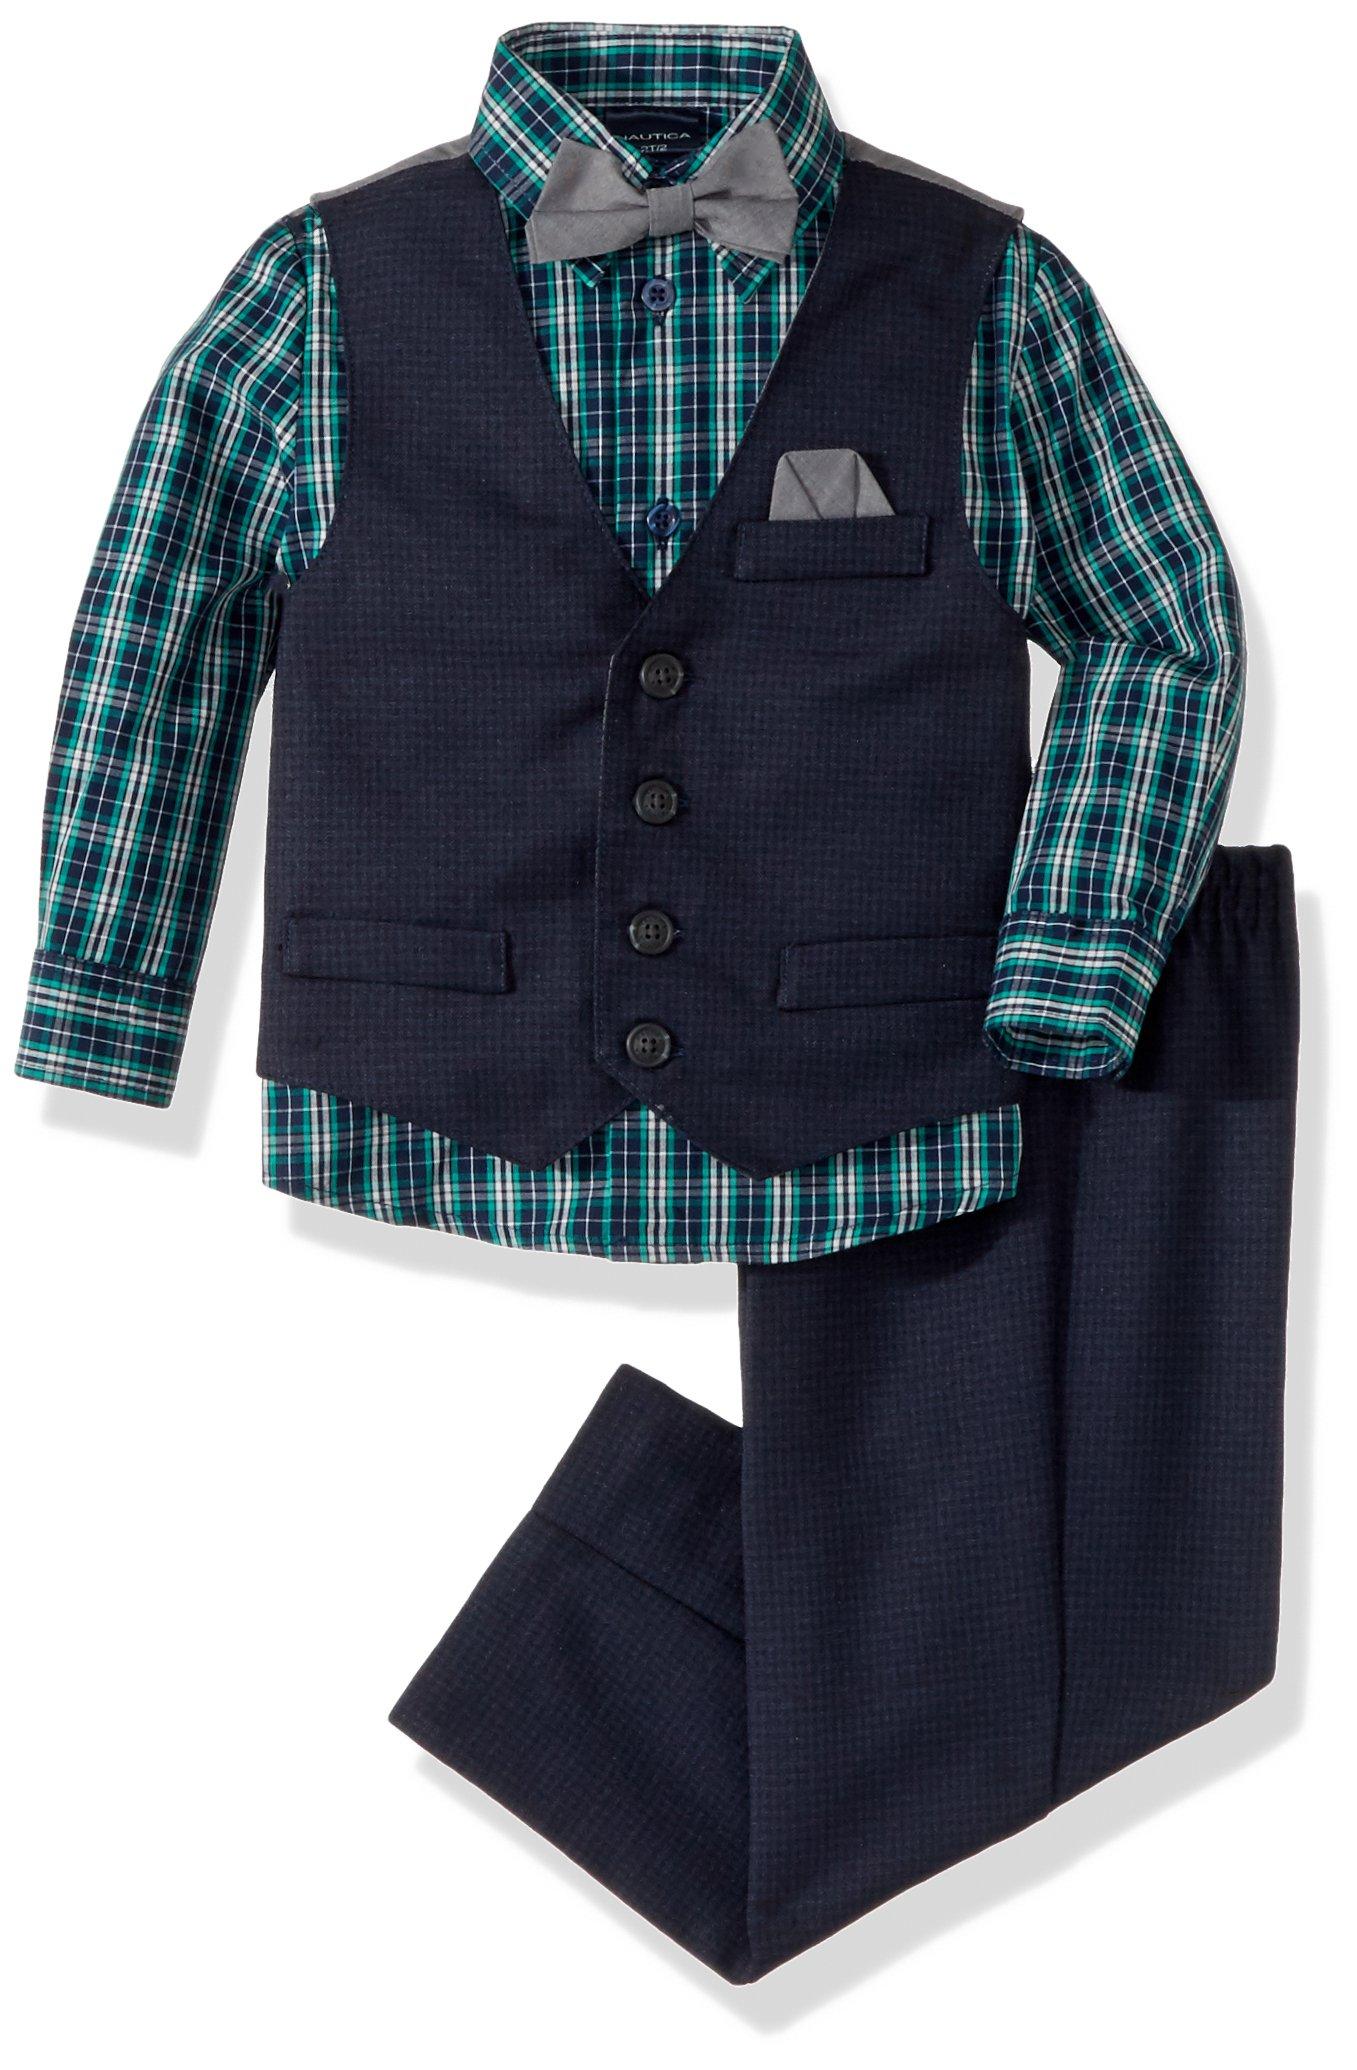 Nautica Boys' 4-Piece Vest Set with Dress Shirt, Bow Tie, Vest, and Pants, Dark Blue, 18